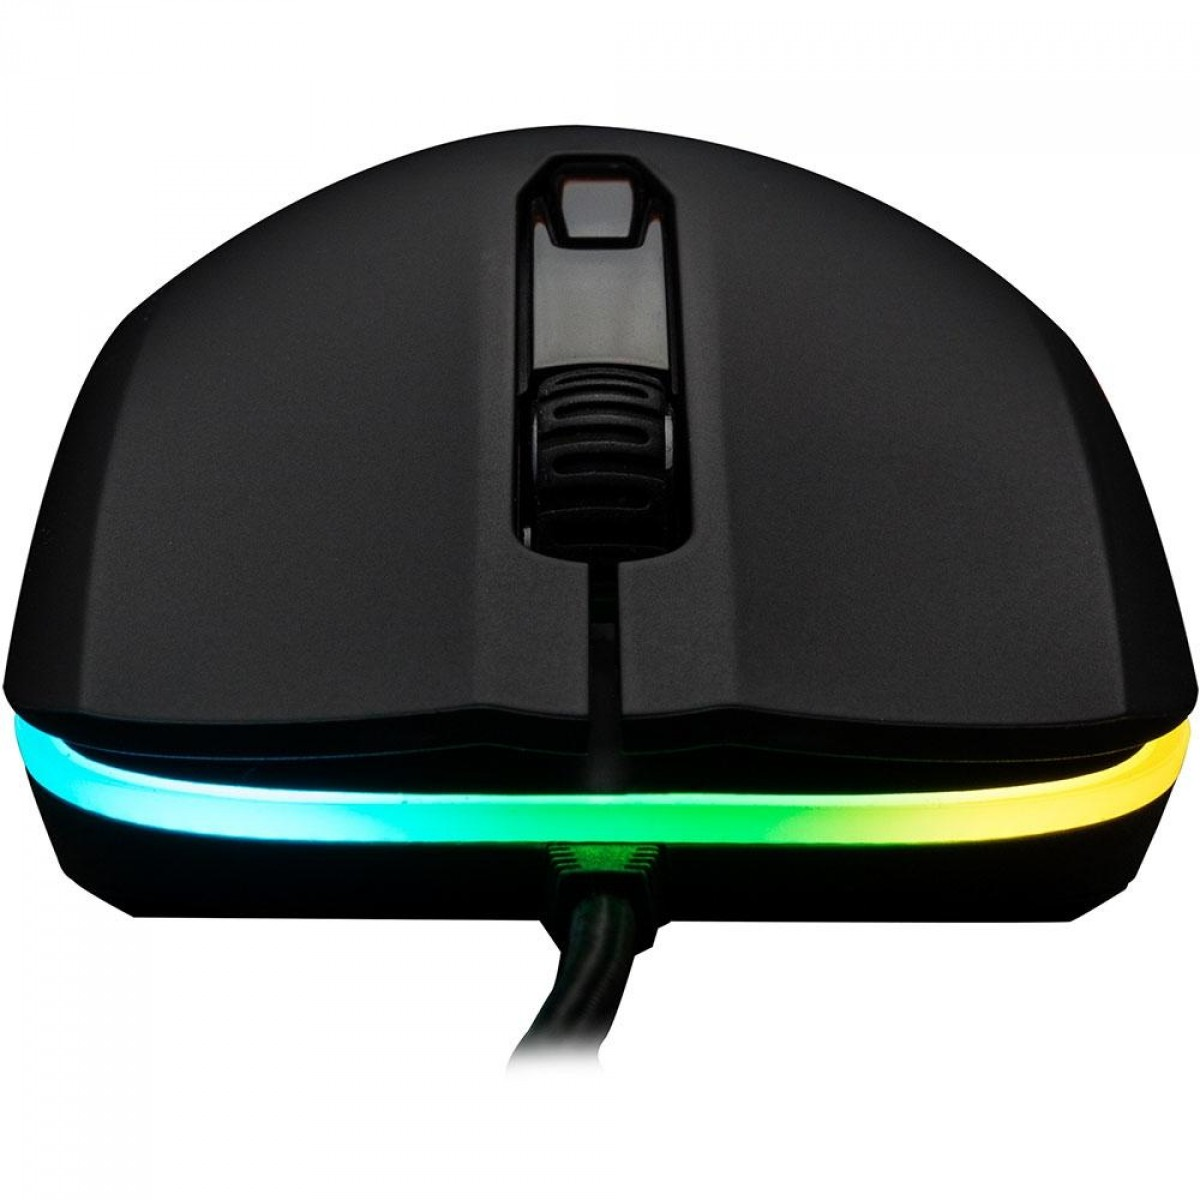 Mouse Gamer HyperX Pulsefire Surge RGB, 16000 DPI, USB, Black, HX-MC002B